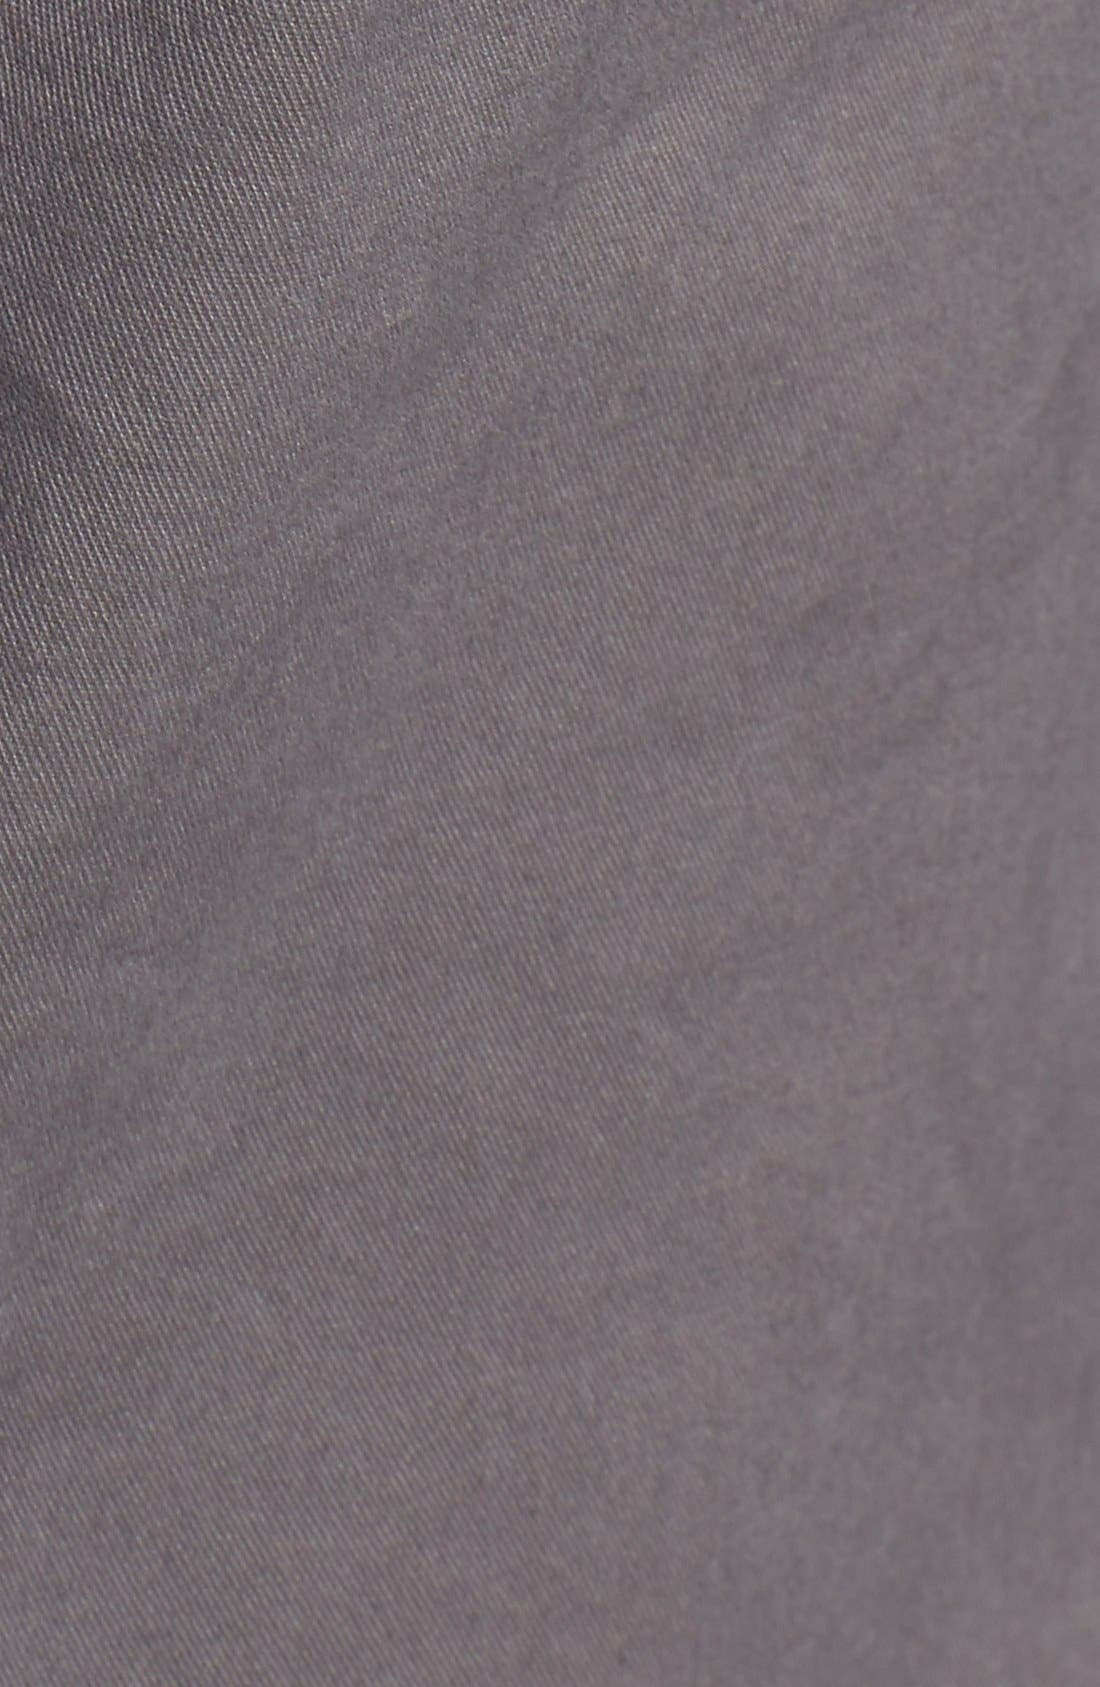 'P55' Slim Fit Stretch Cotton Chinos,                             Alternate thumbnail 5, color,                             CASTLEROCK